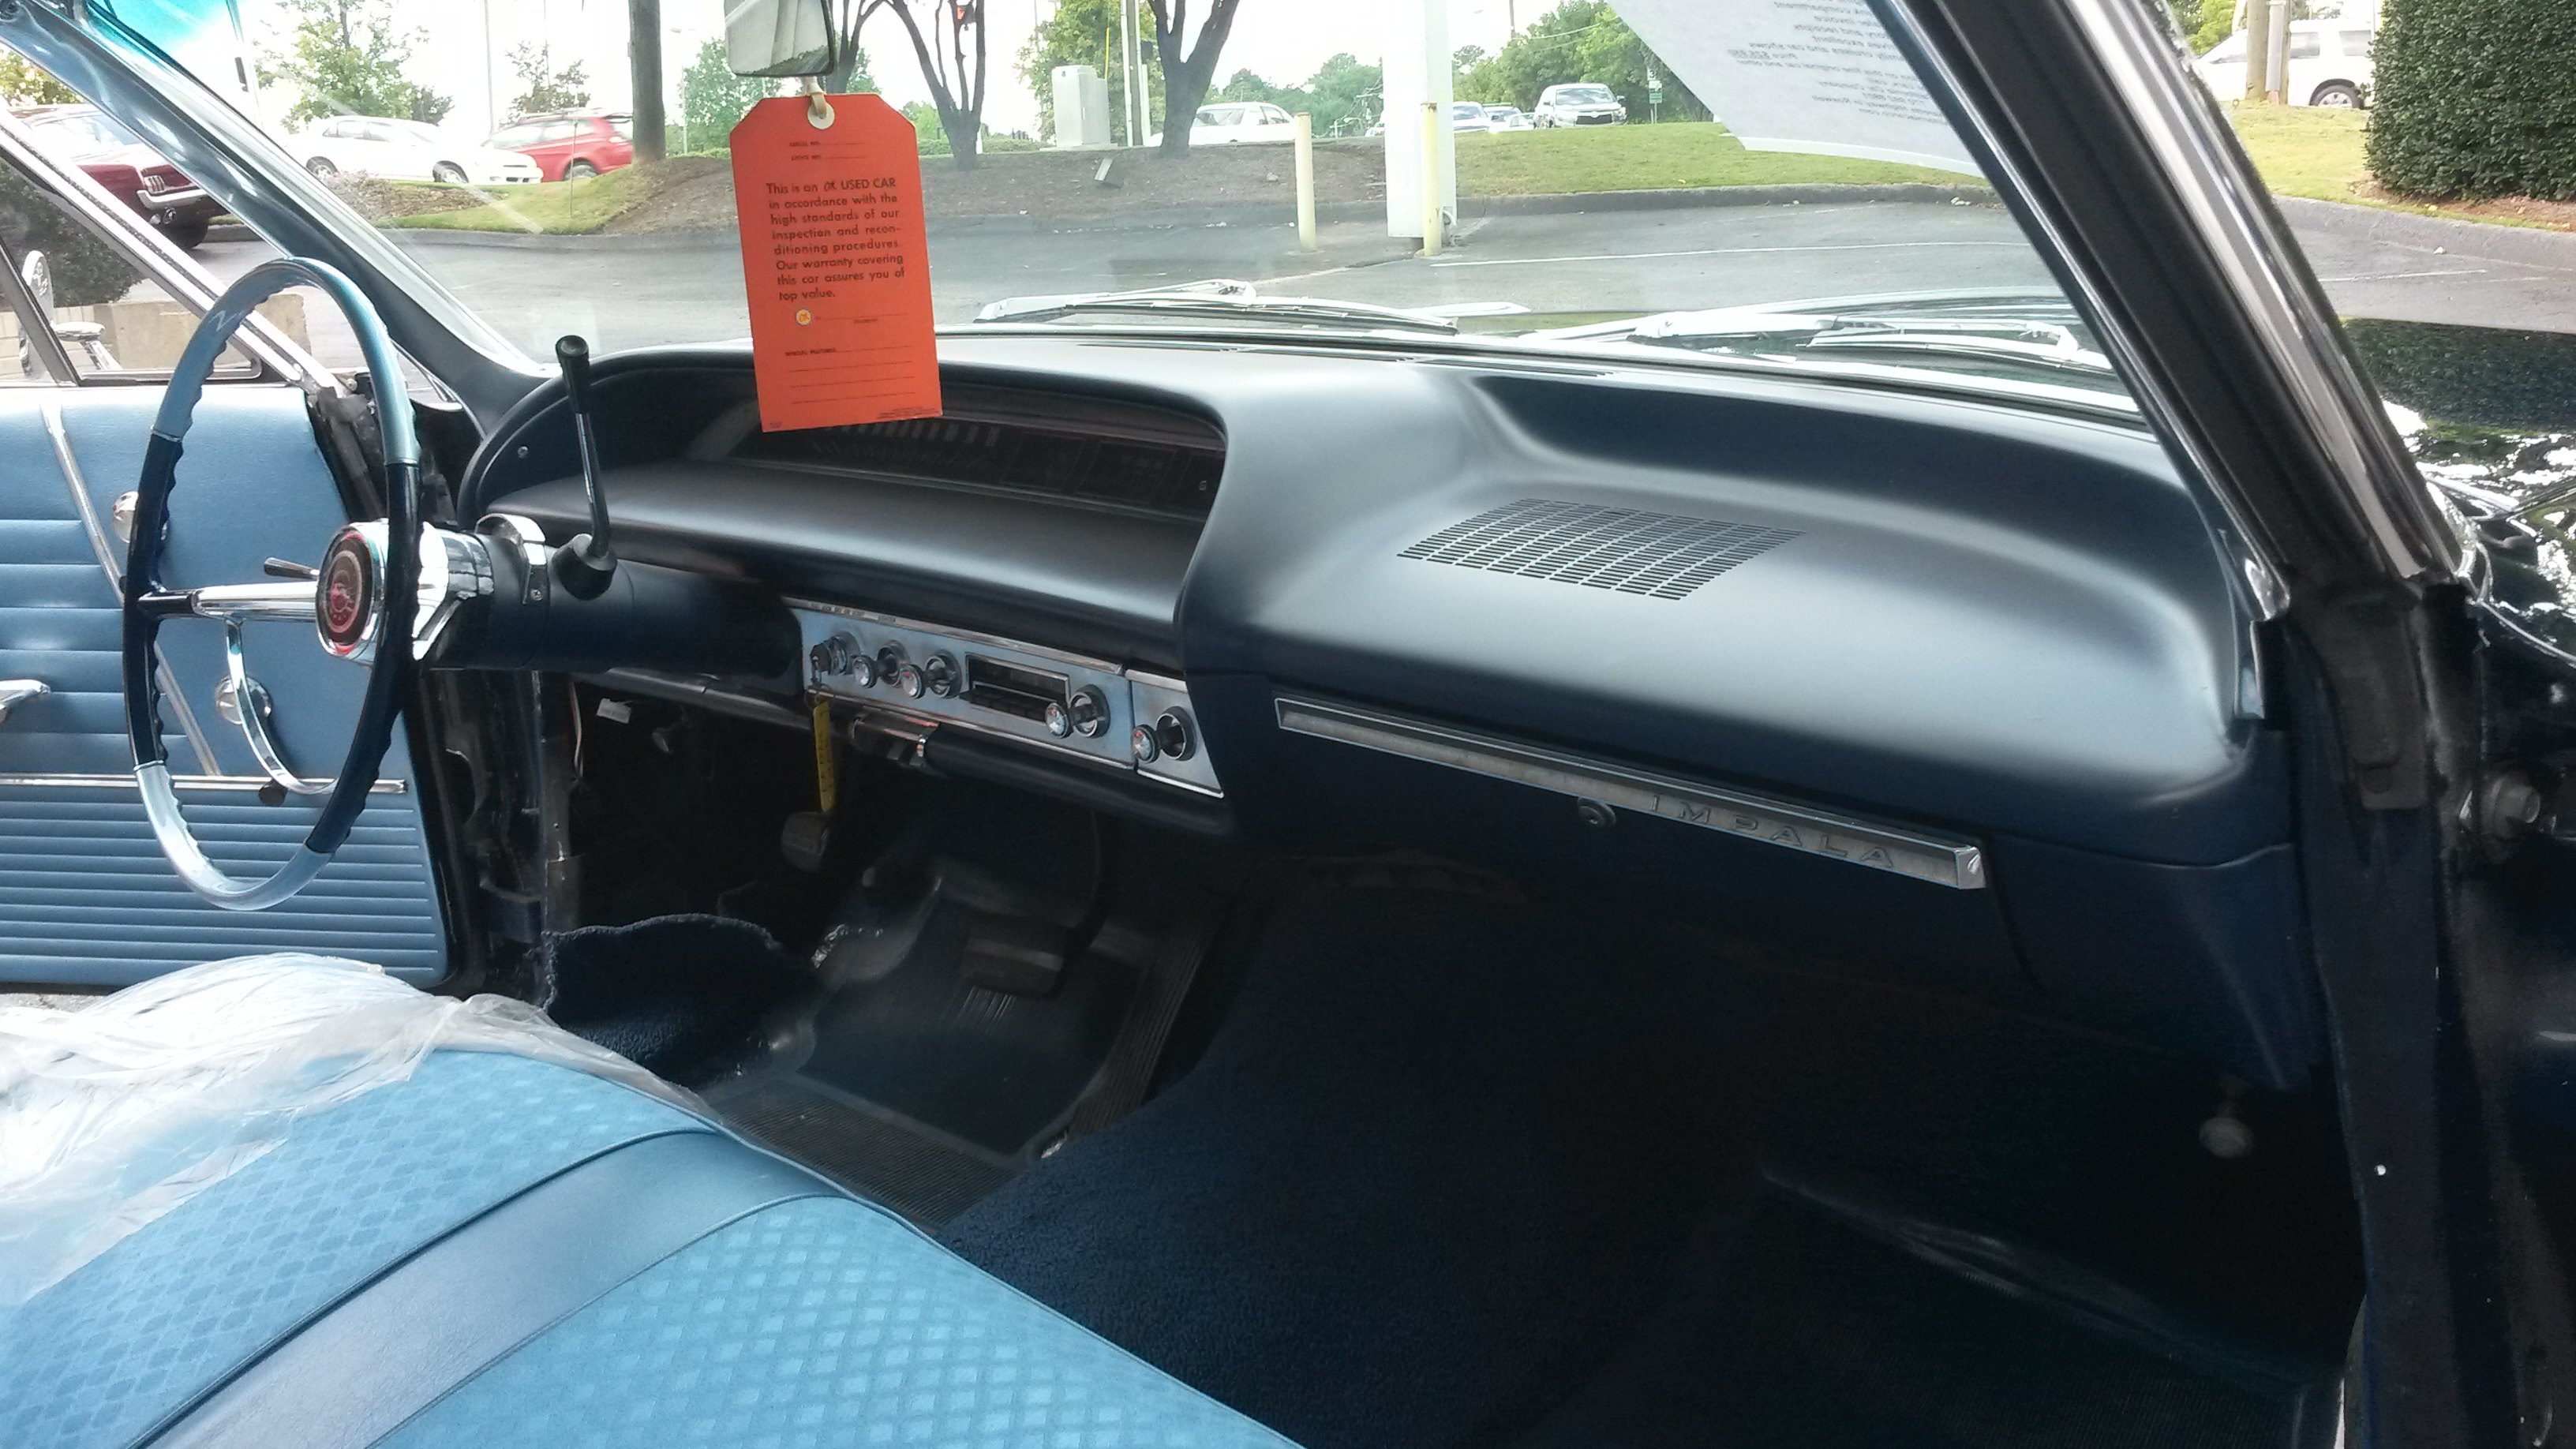 1964 Impala Two Door Hardtop (18)